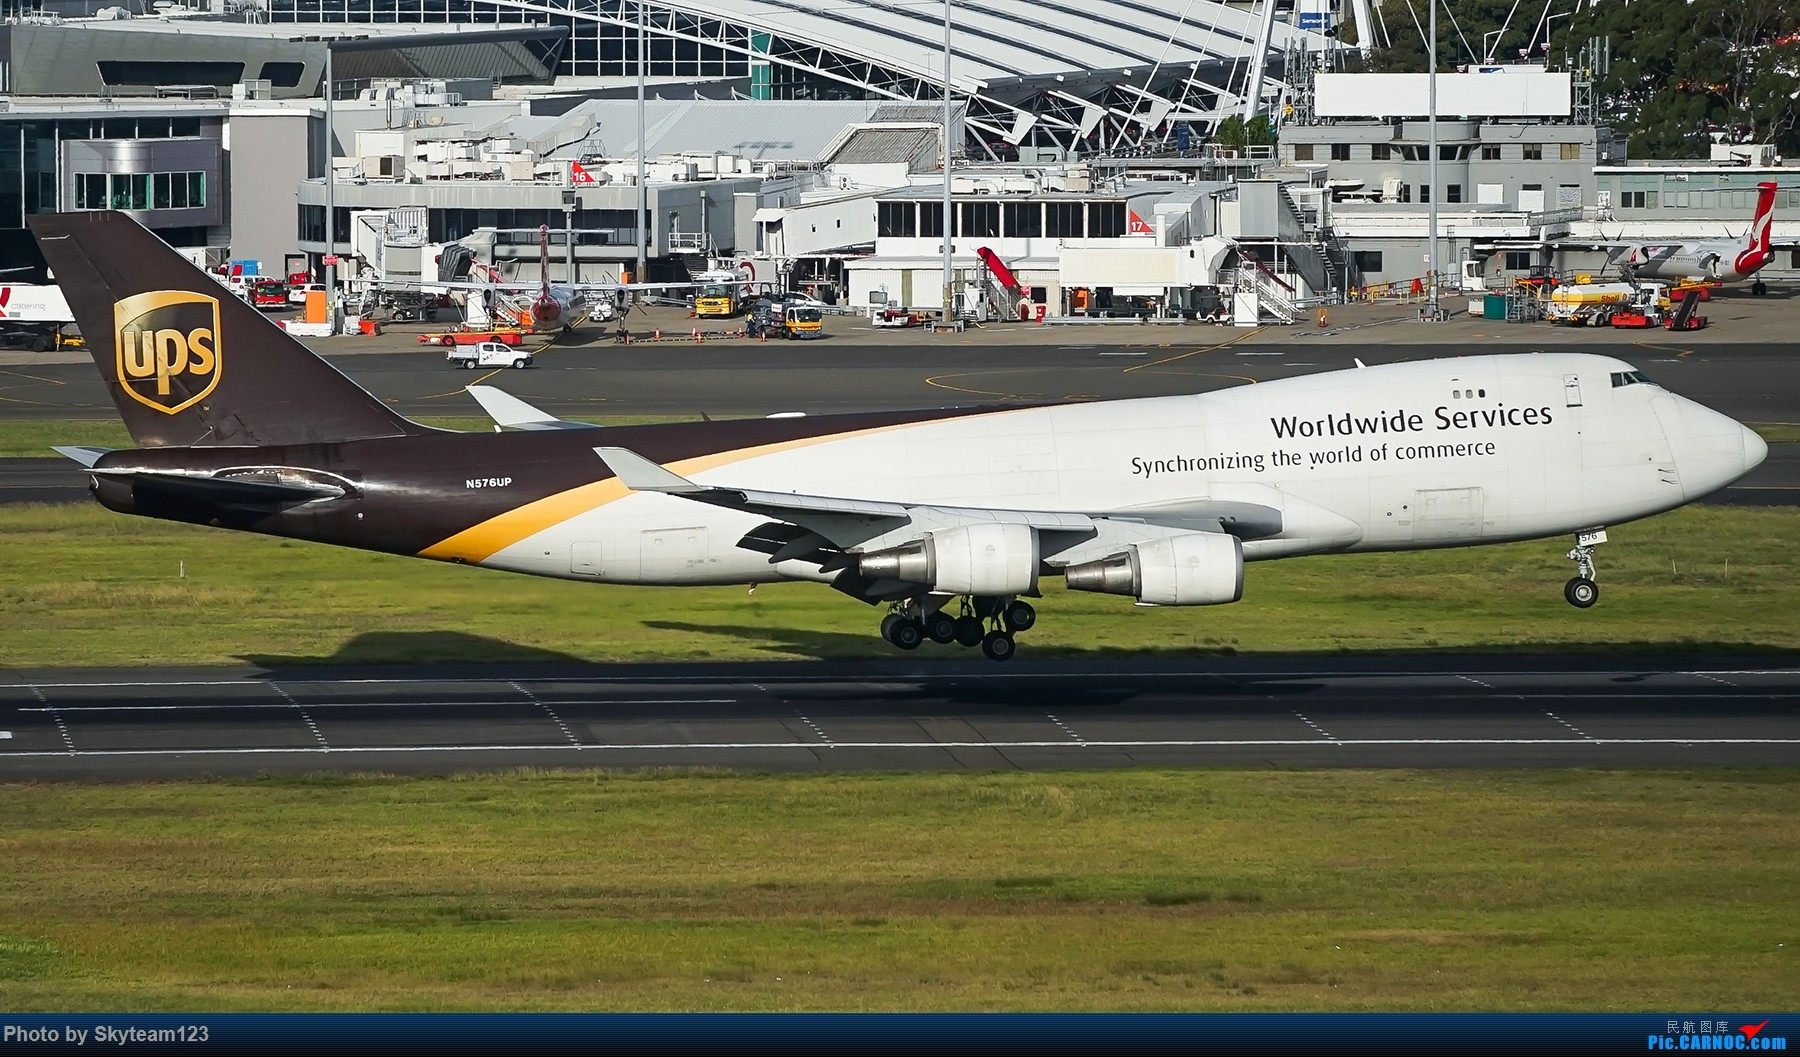 Re:[原创]【SYD】解锁T1国际航站旁停车场顶楼拍机位 下午16R抵达的好货们以及夜拍轨迹 BOEING 747-400F